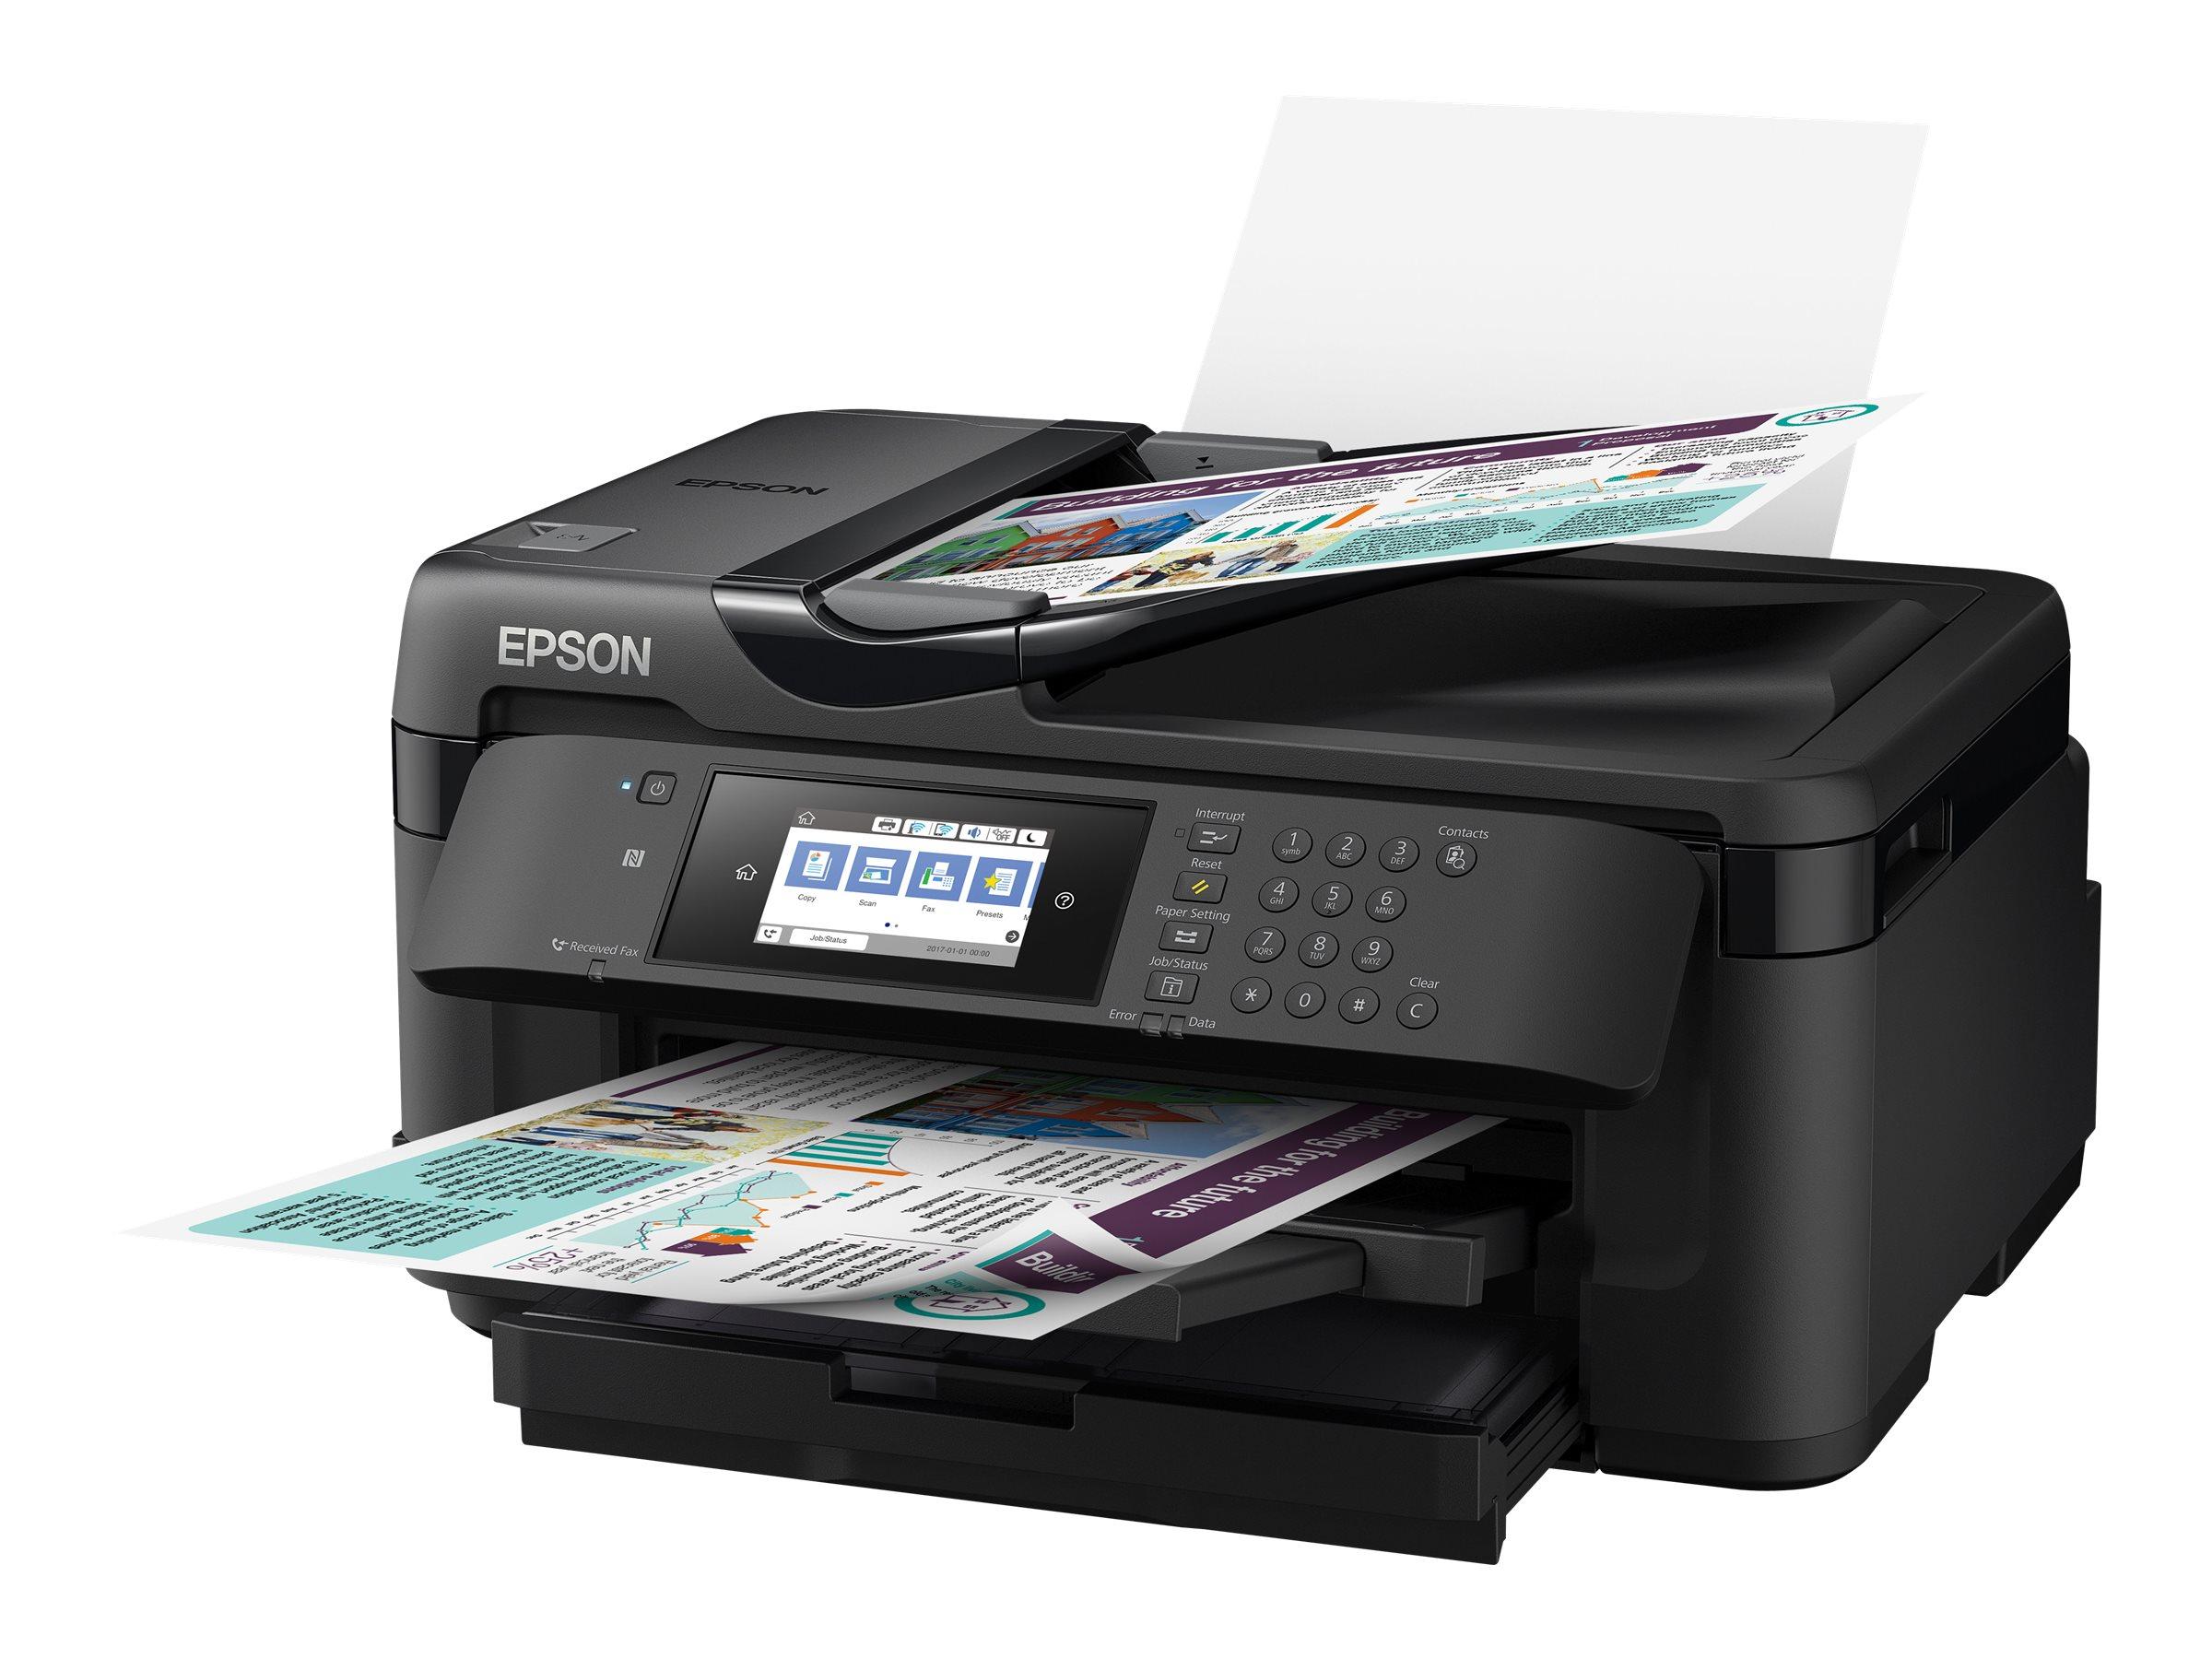 Epson WorkForce WF-7710DWF - Multifunktionsdrucker